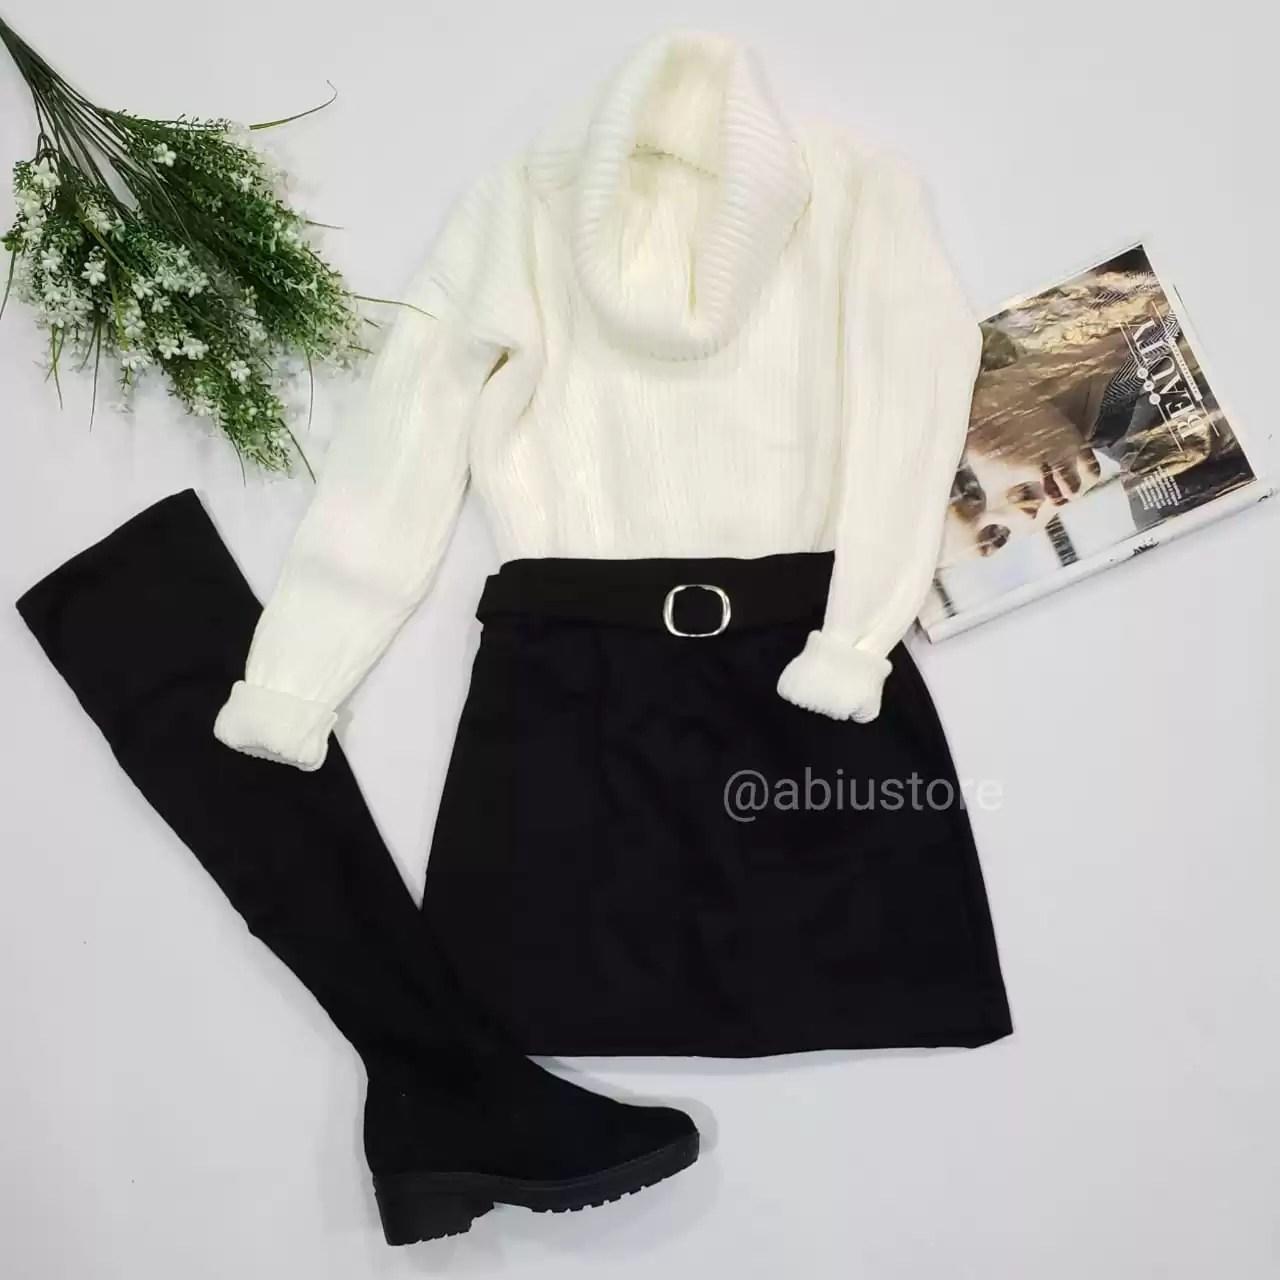 Abiú tienda online